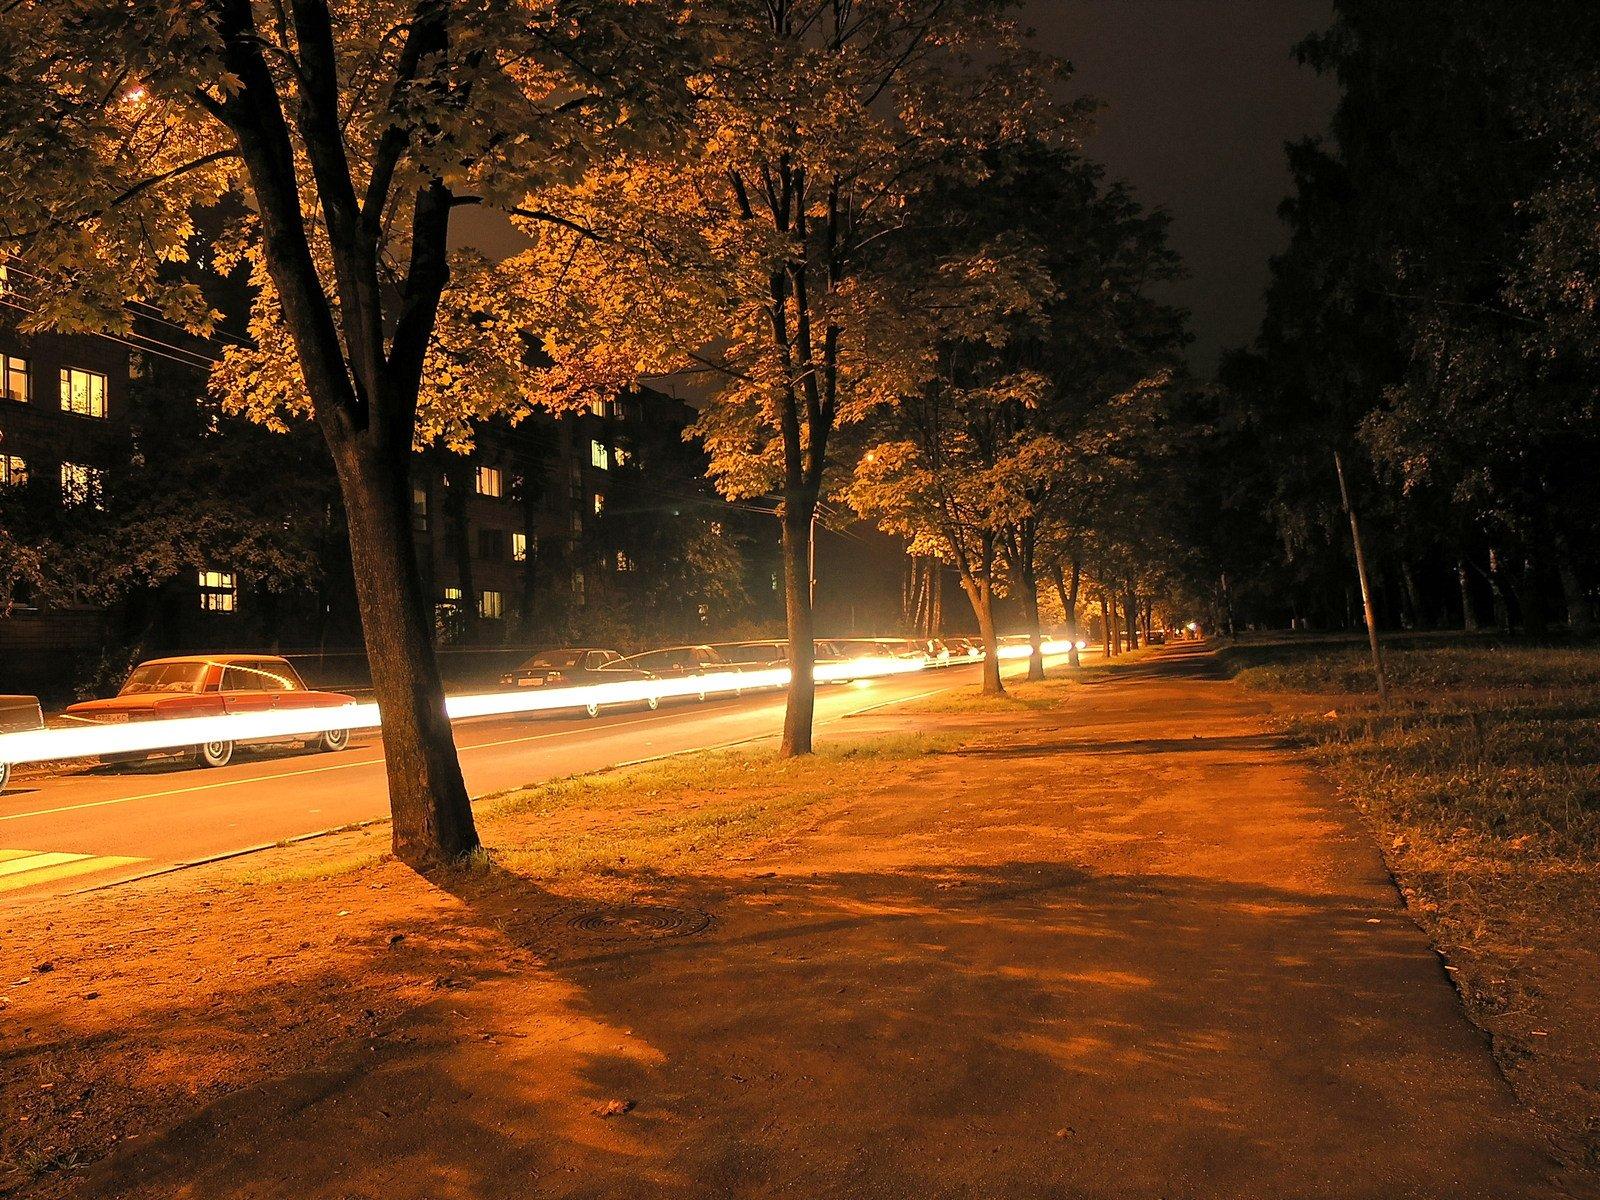 free 夜间街道 2 stock photo